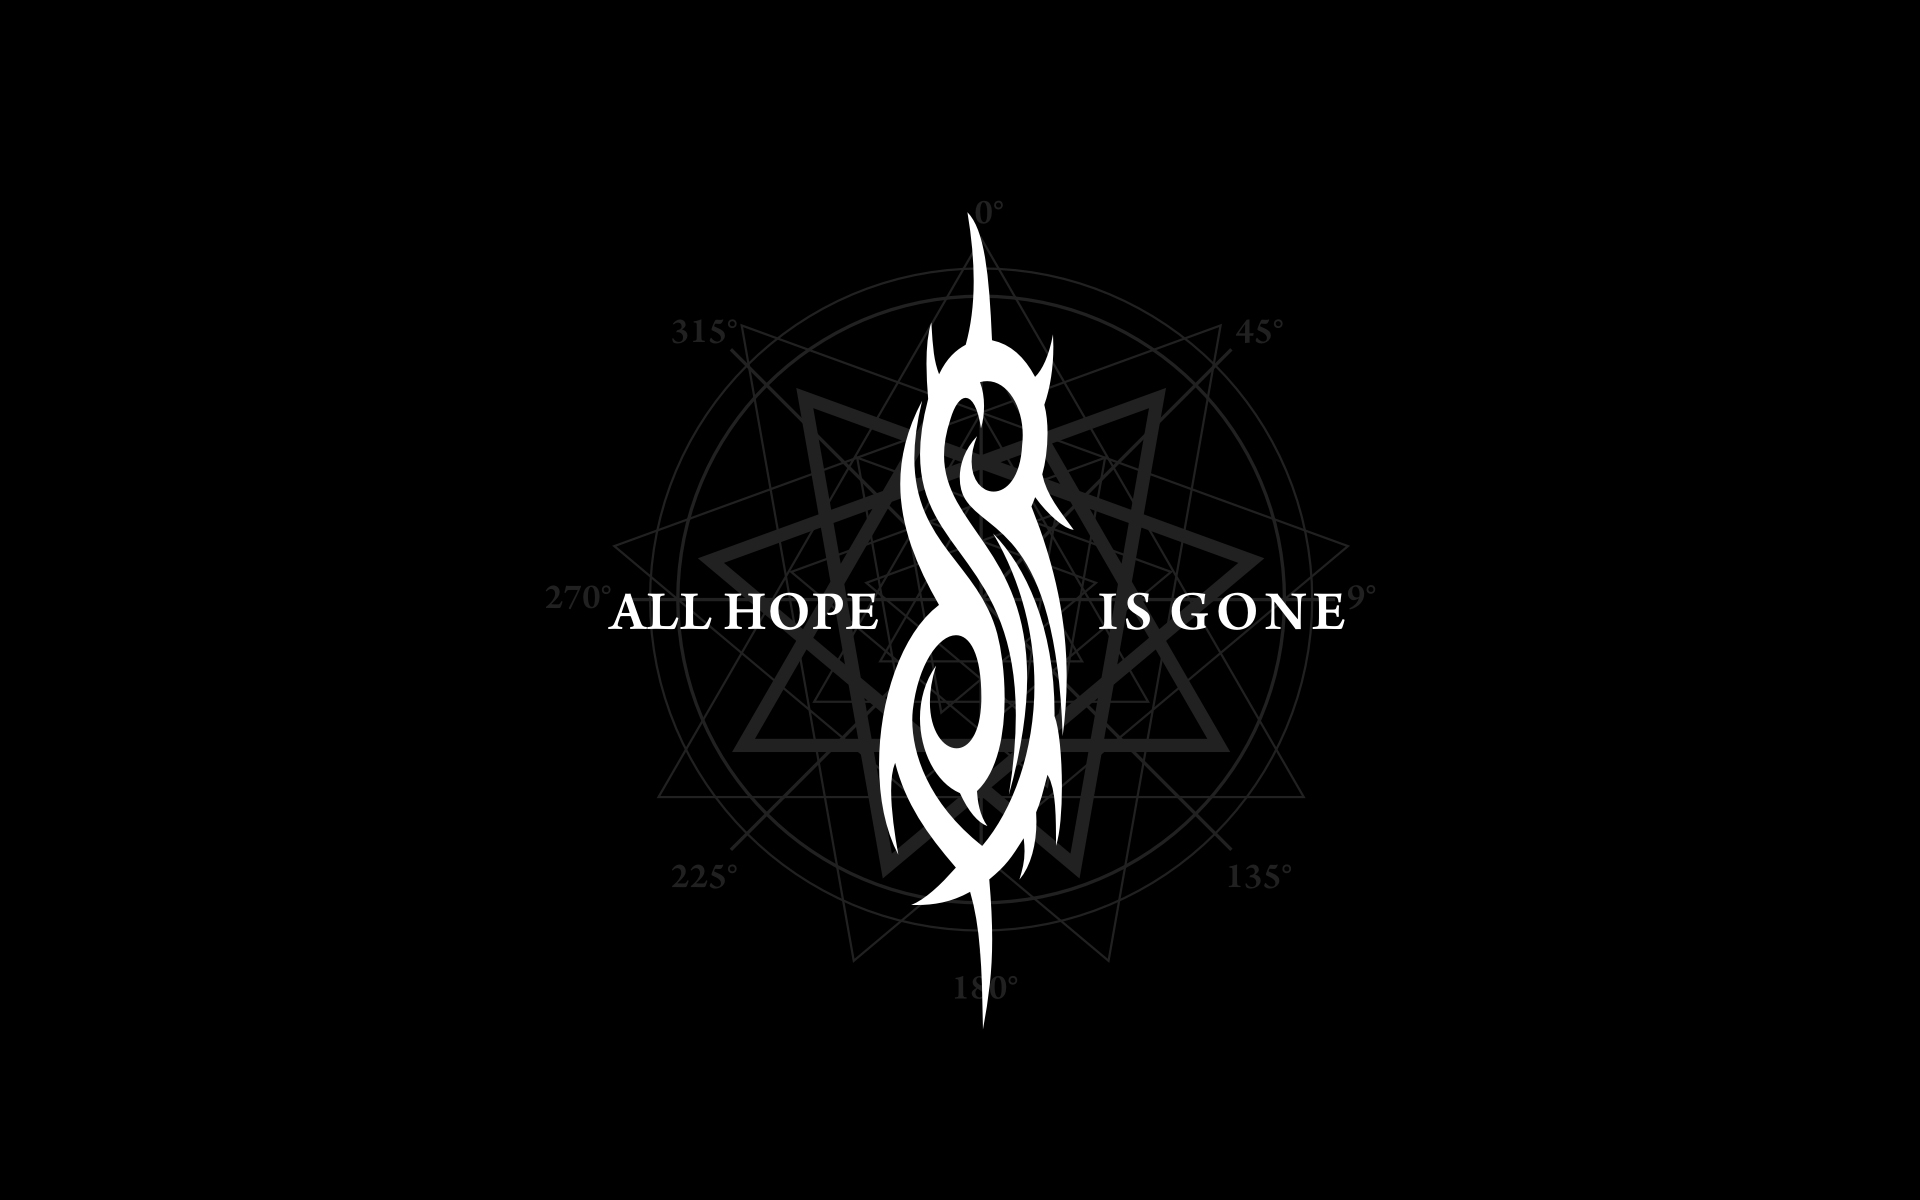 Slipknot Wallpapers HD logo black background